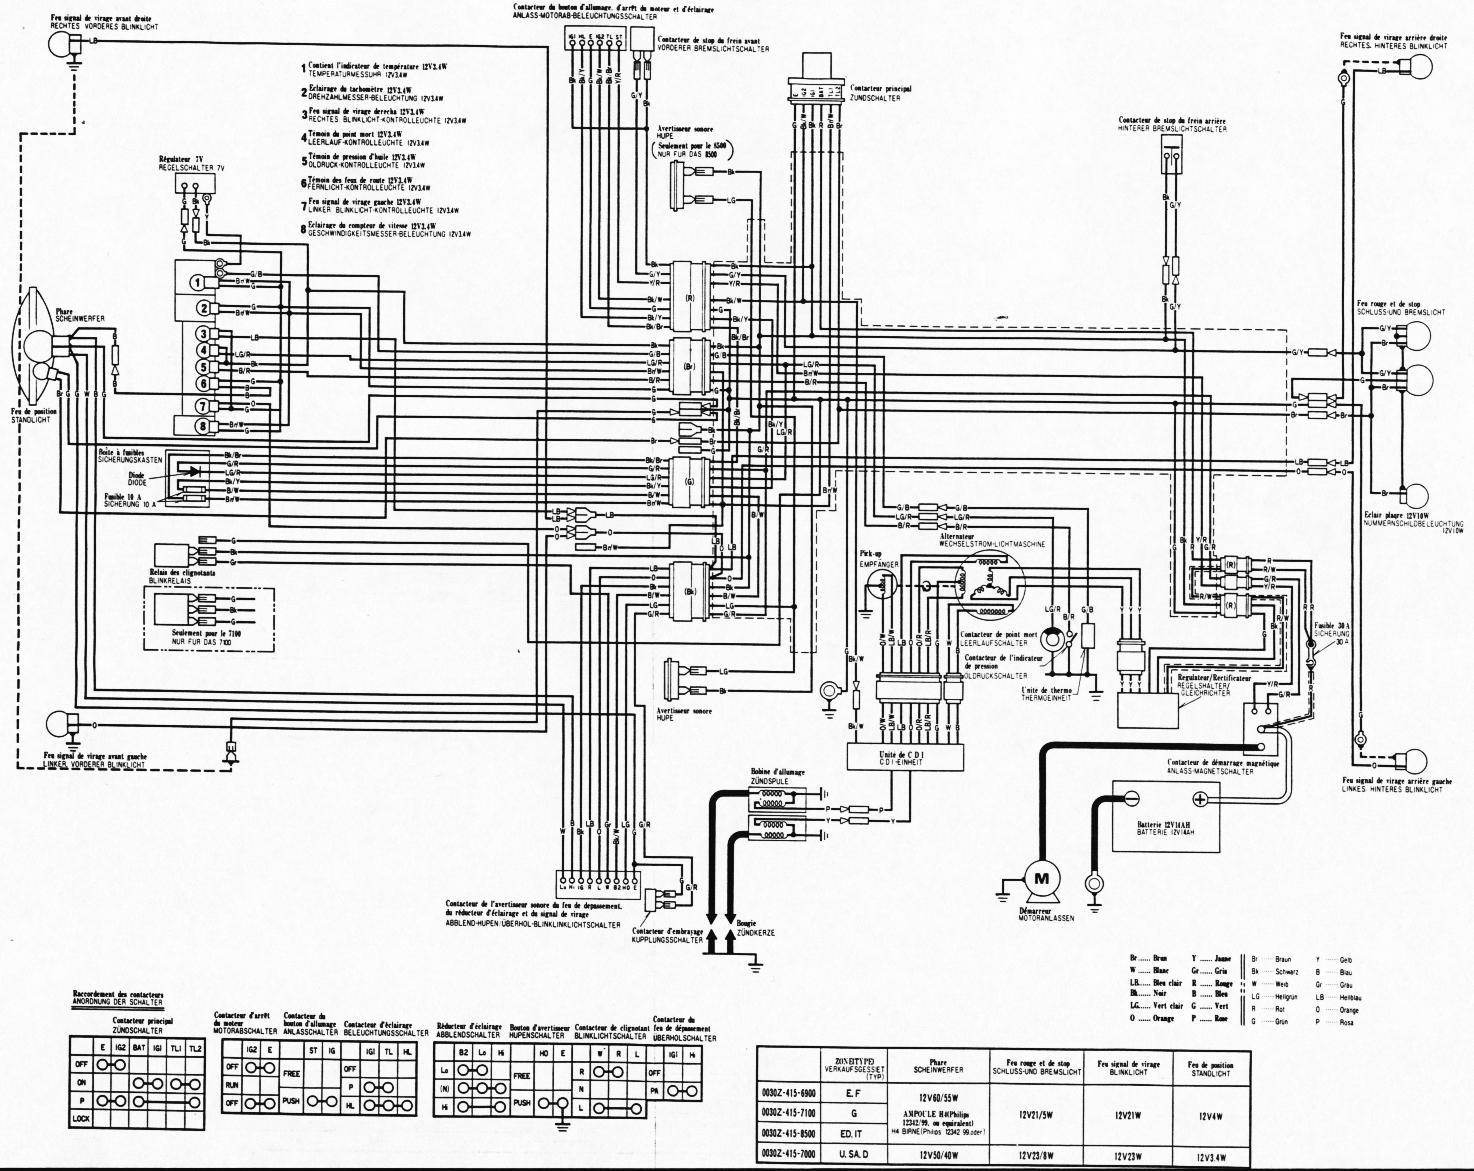 File:1981 Honda Cx500 Wiring Diagram Cx500.jpg